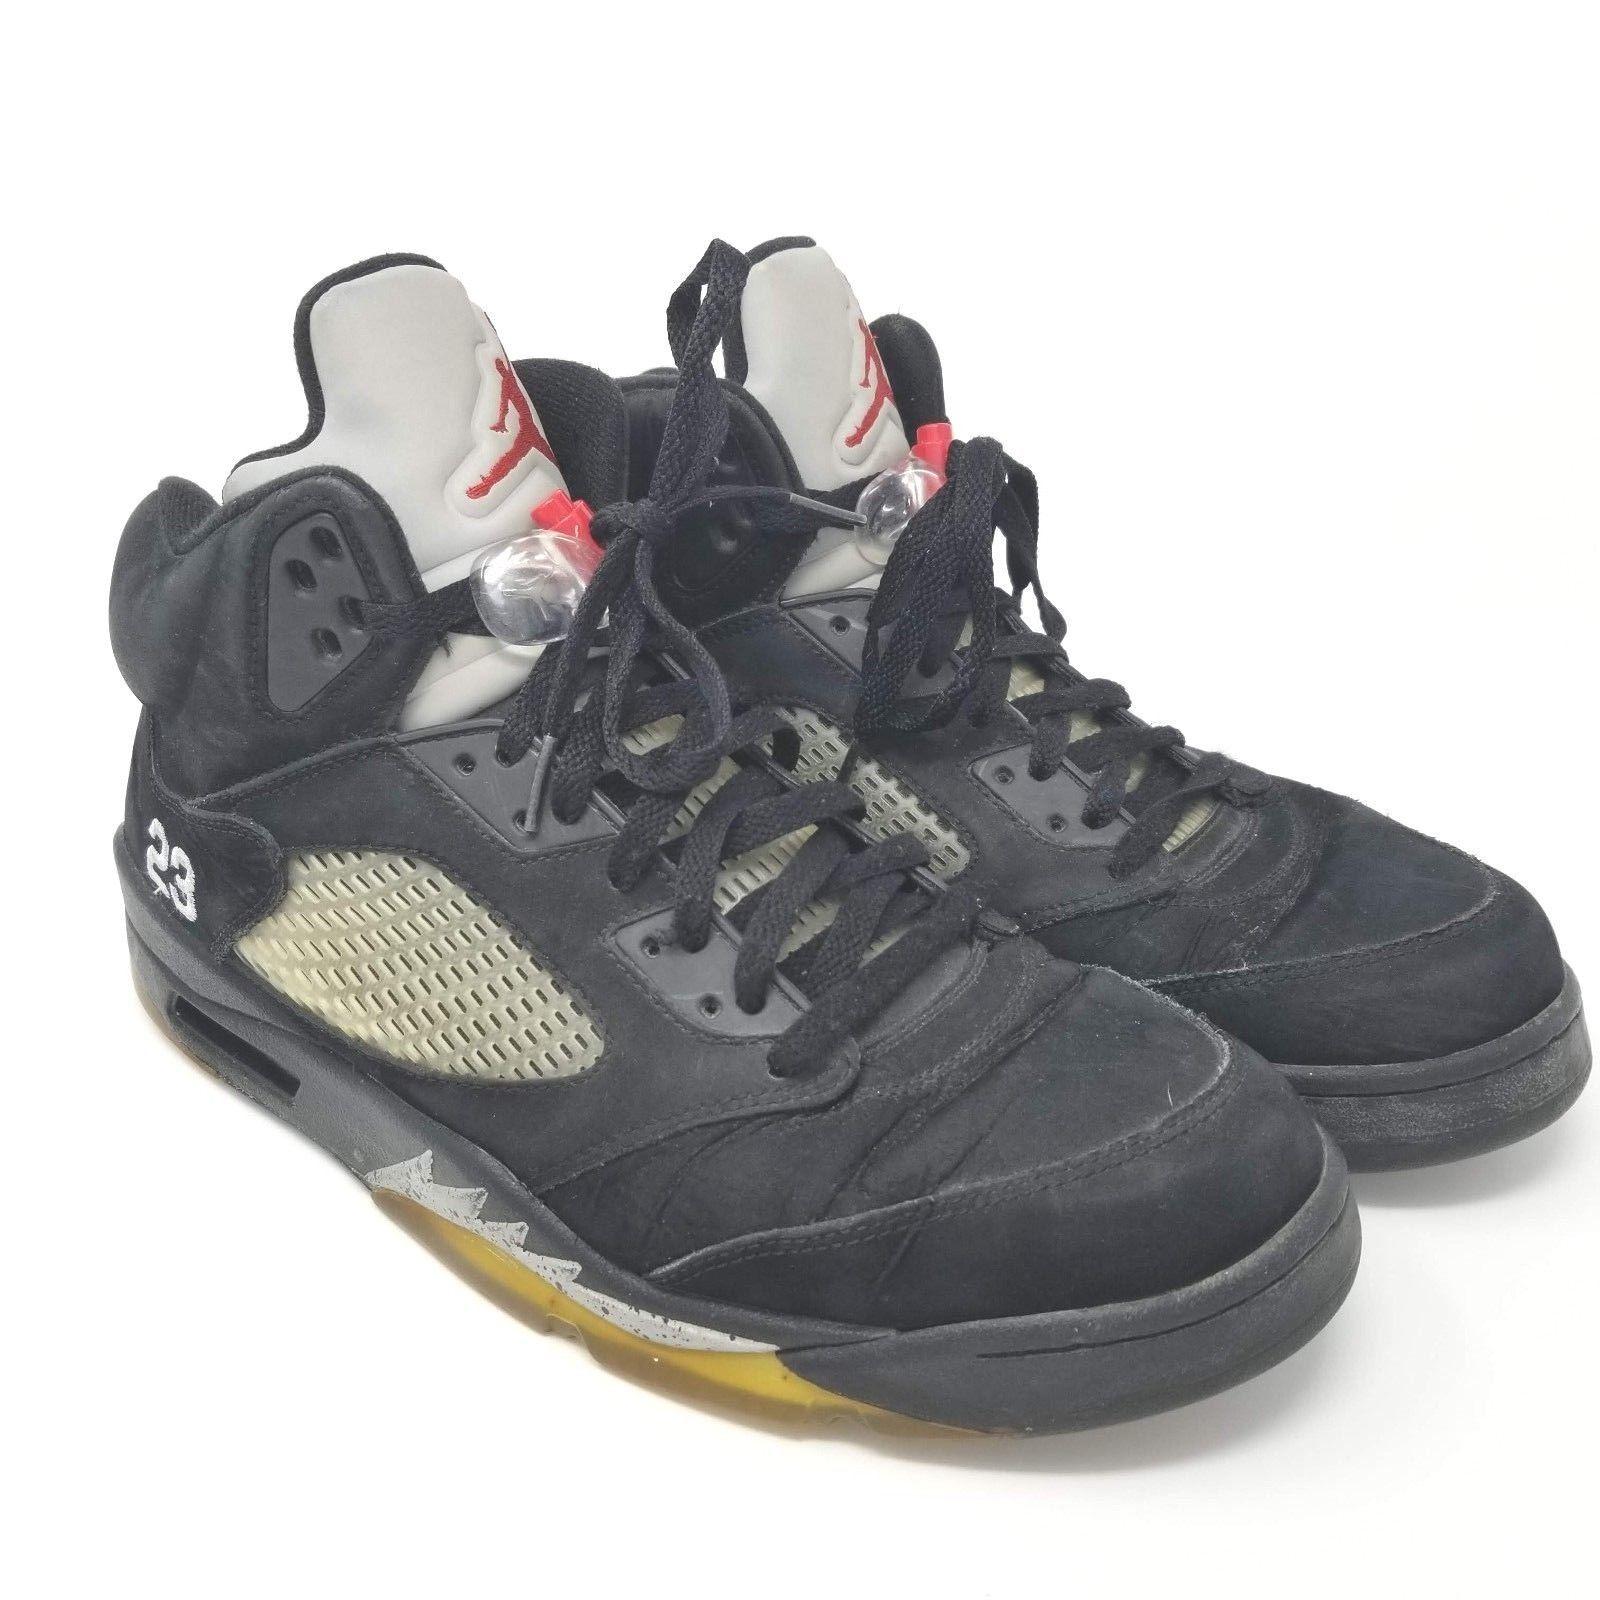 2b361129217 57. 57. Previous. 2011 Jordan Retro V 5 Black Varsity Red Metallic Silver  136027-010 Sz 12 · 2011 ...